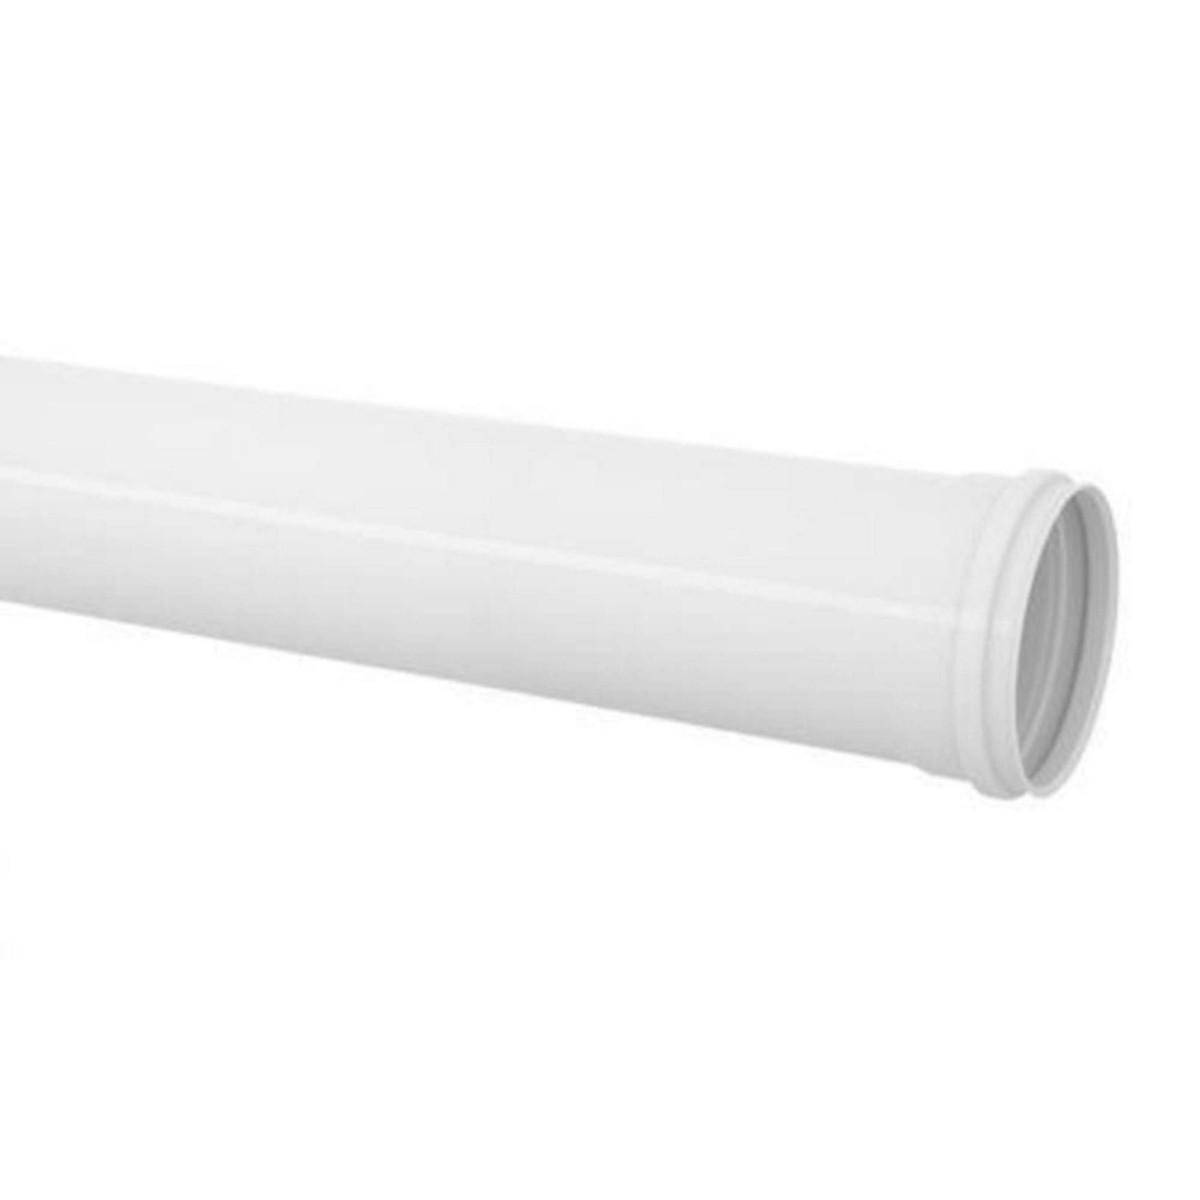 Esgoto Tubo Série Normal 75mm - 3